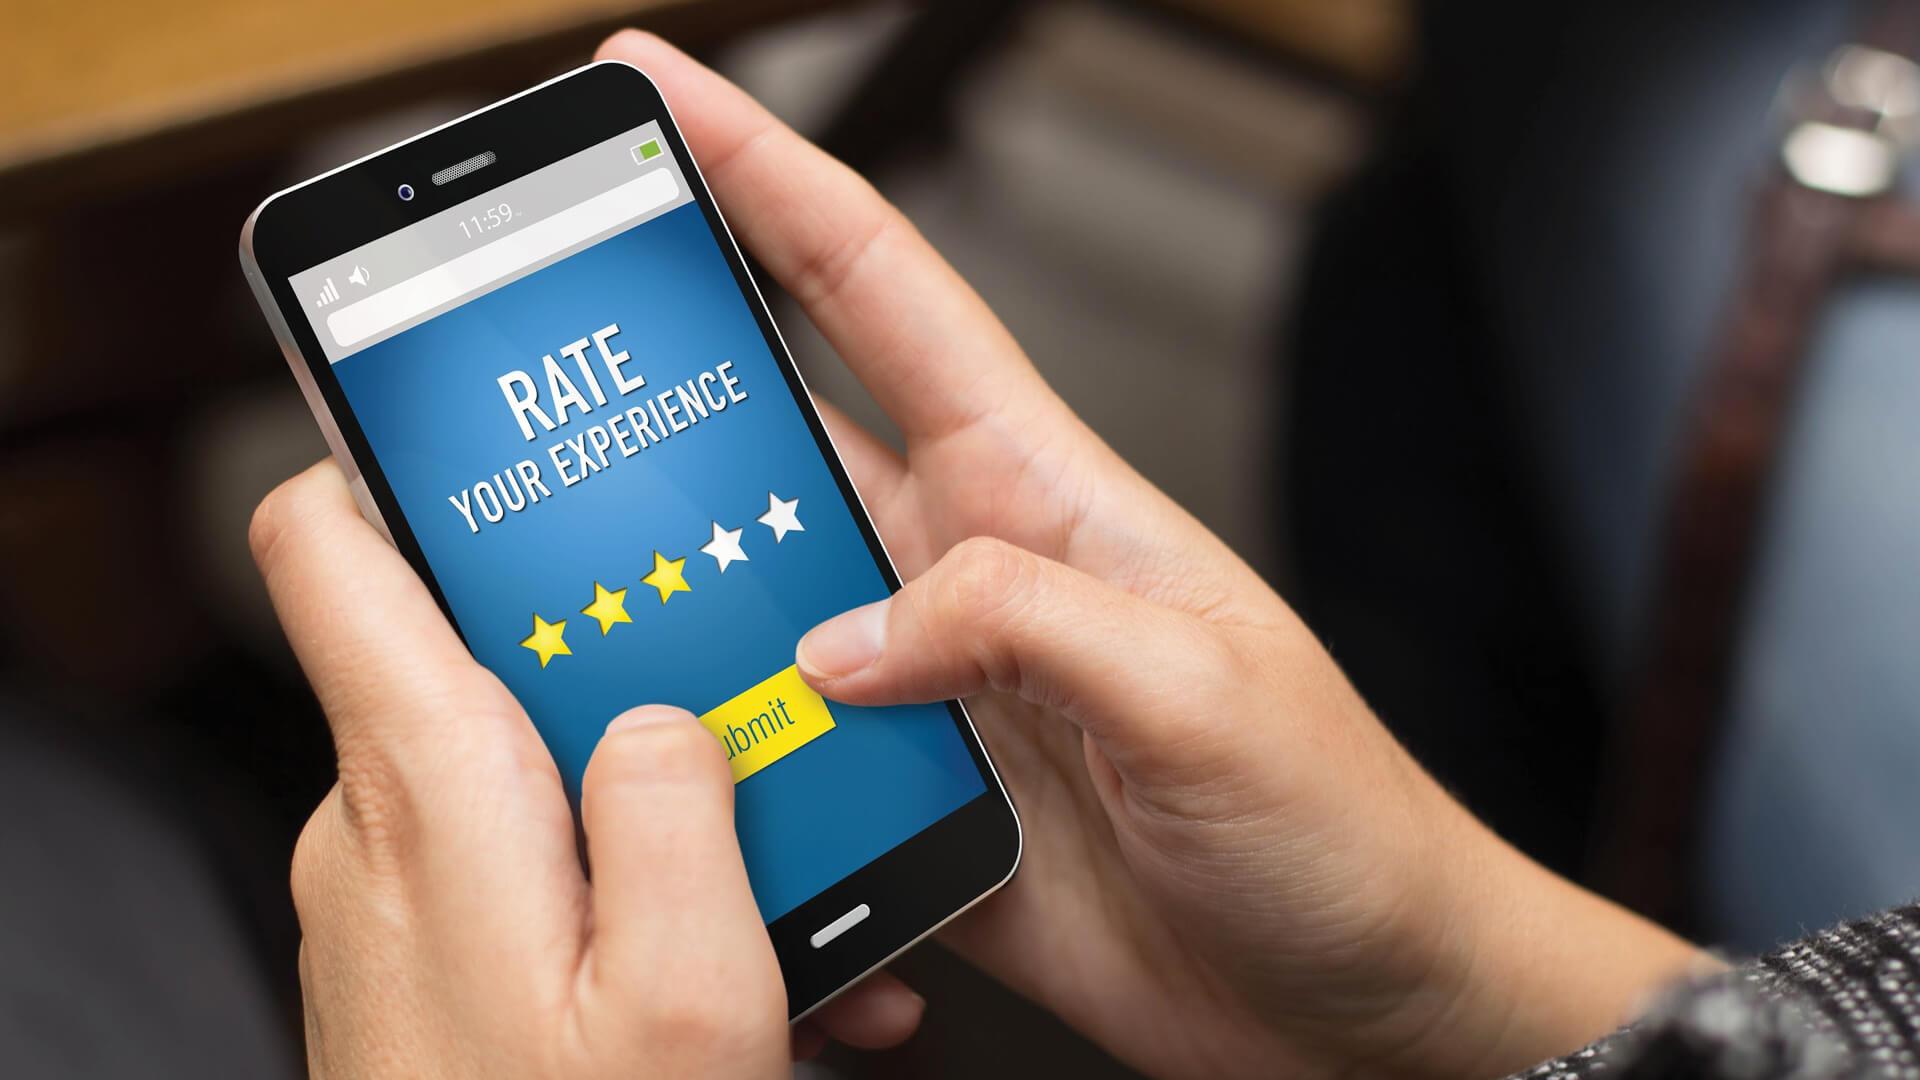 The rating screen for online reviews | Digital Legacies: Criticism | Julius Wiedemann | STIRworld